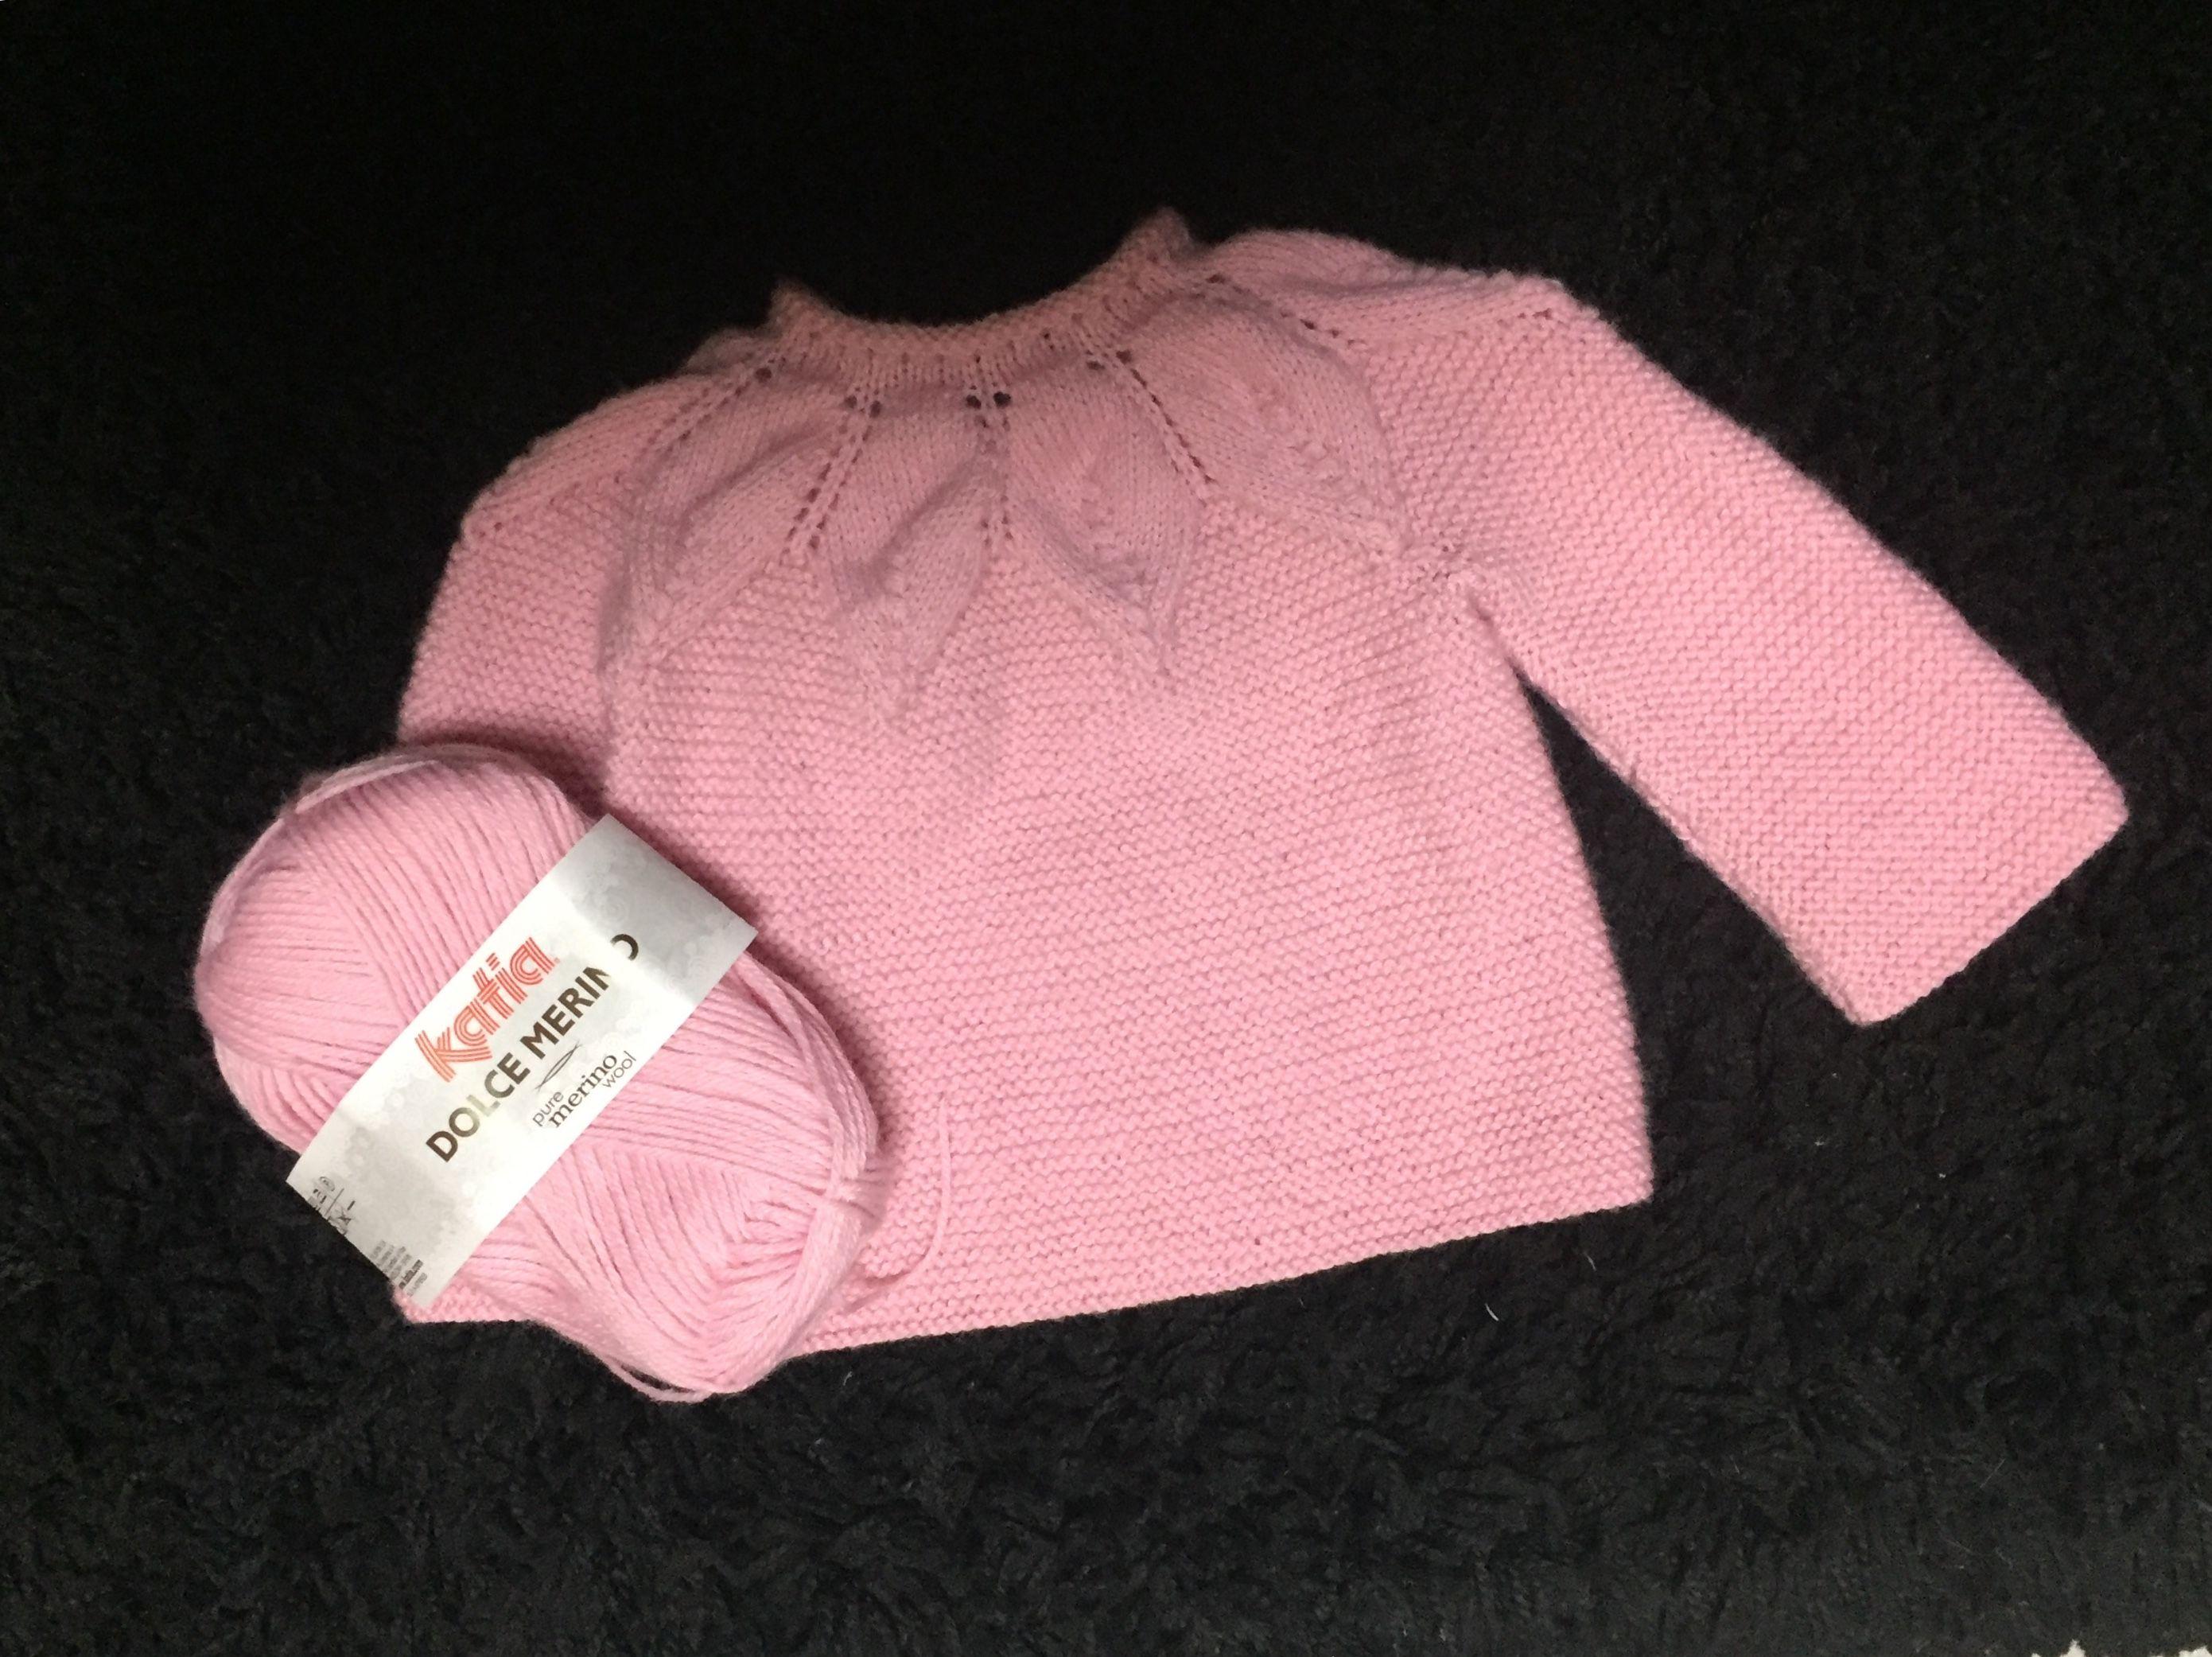 890d22c3f Jersey bebé hojas - Punto moderno